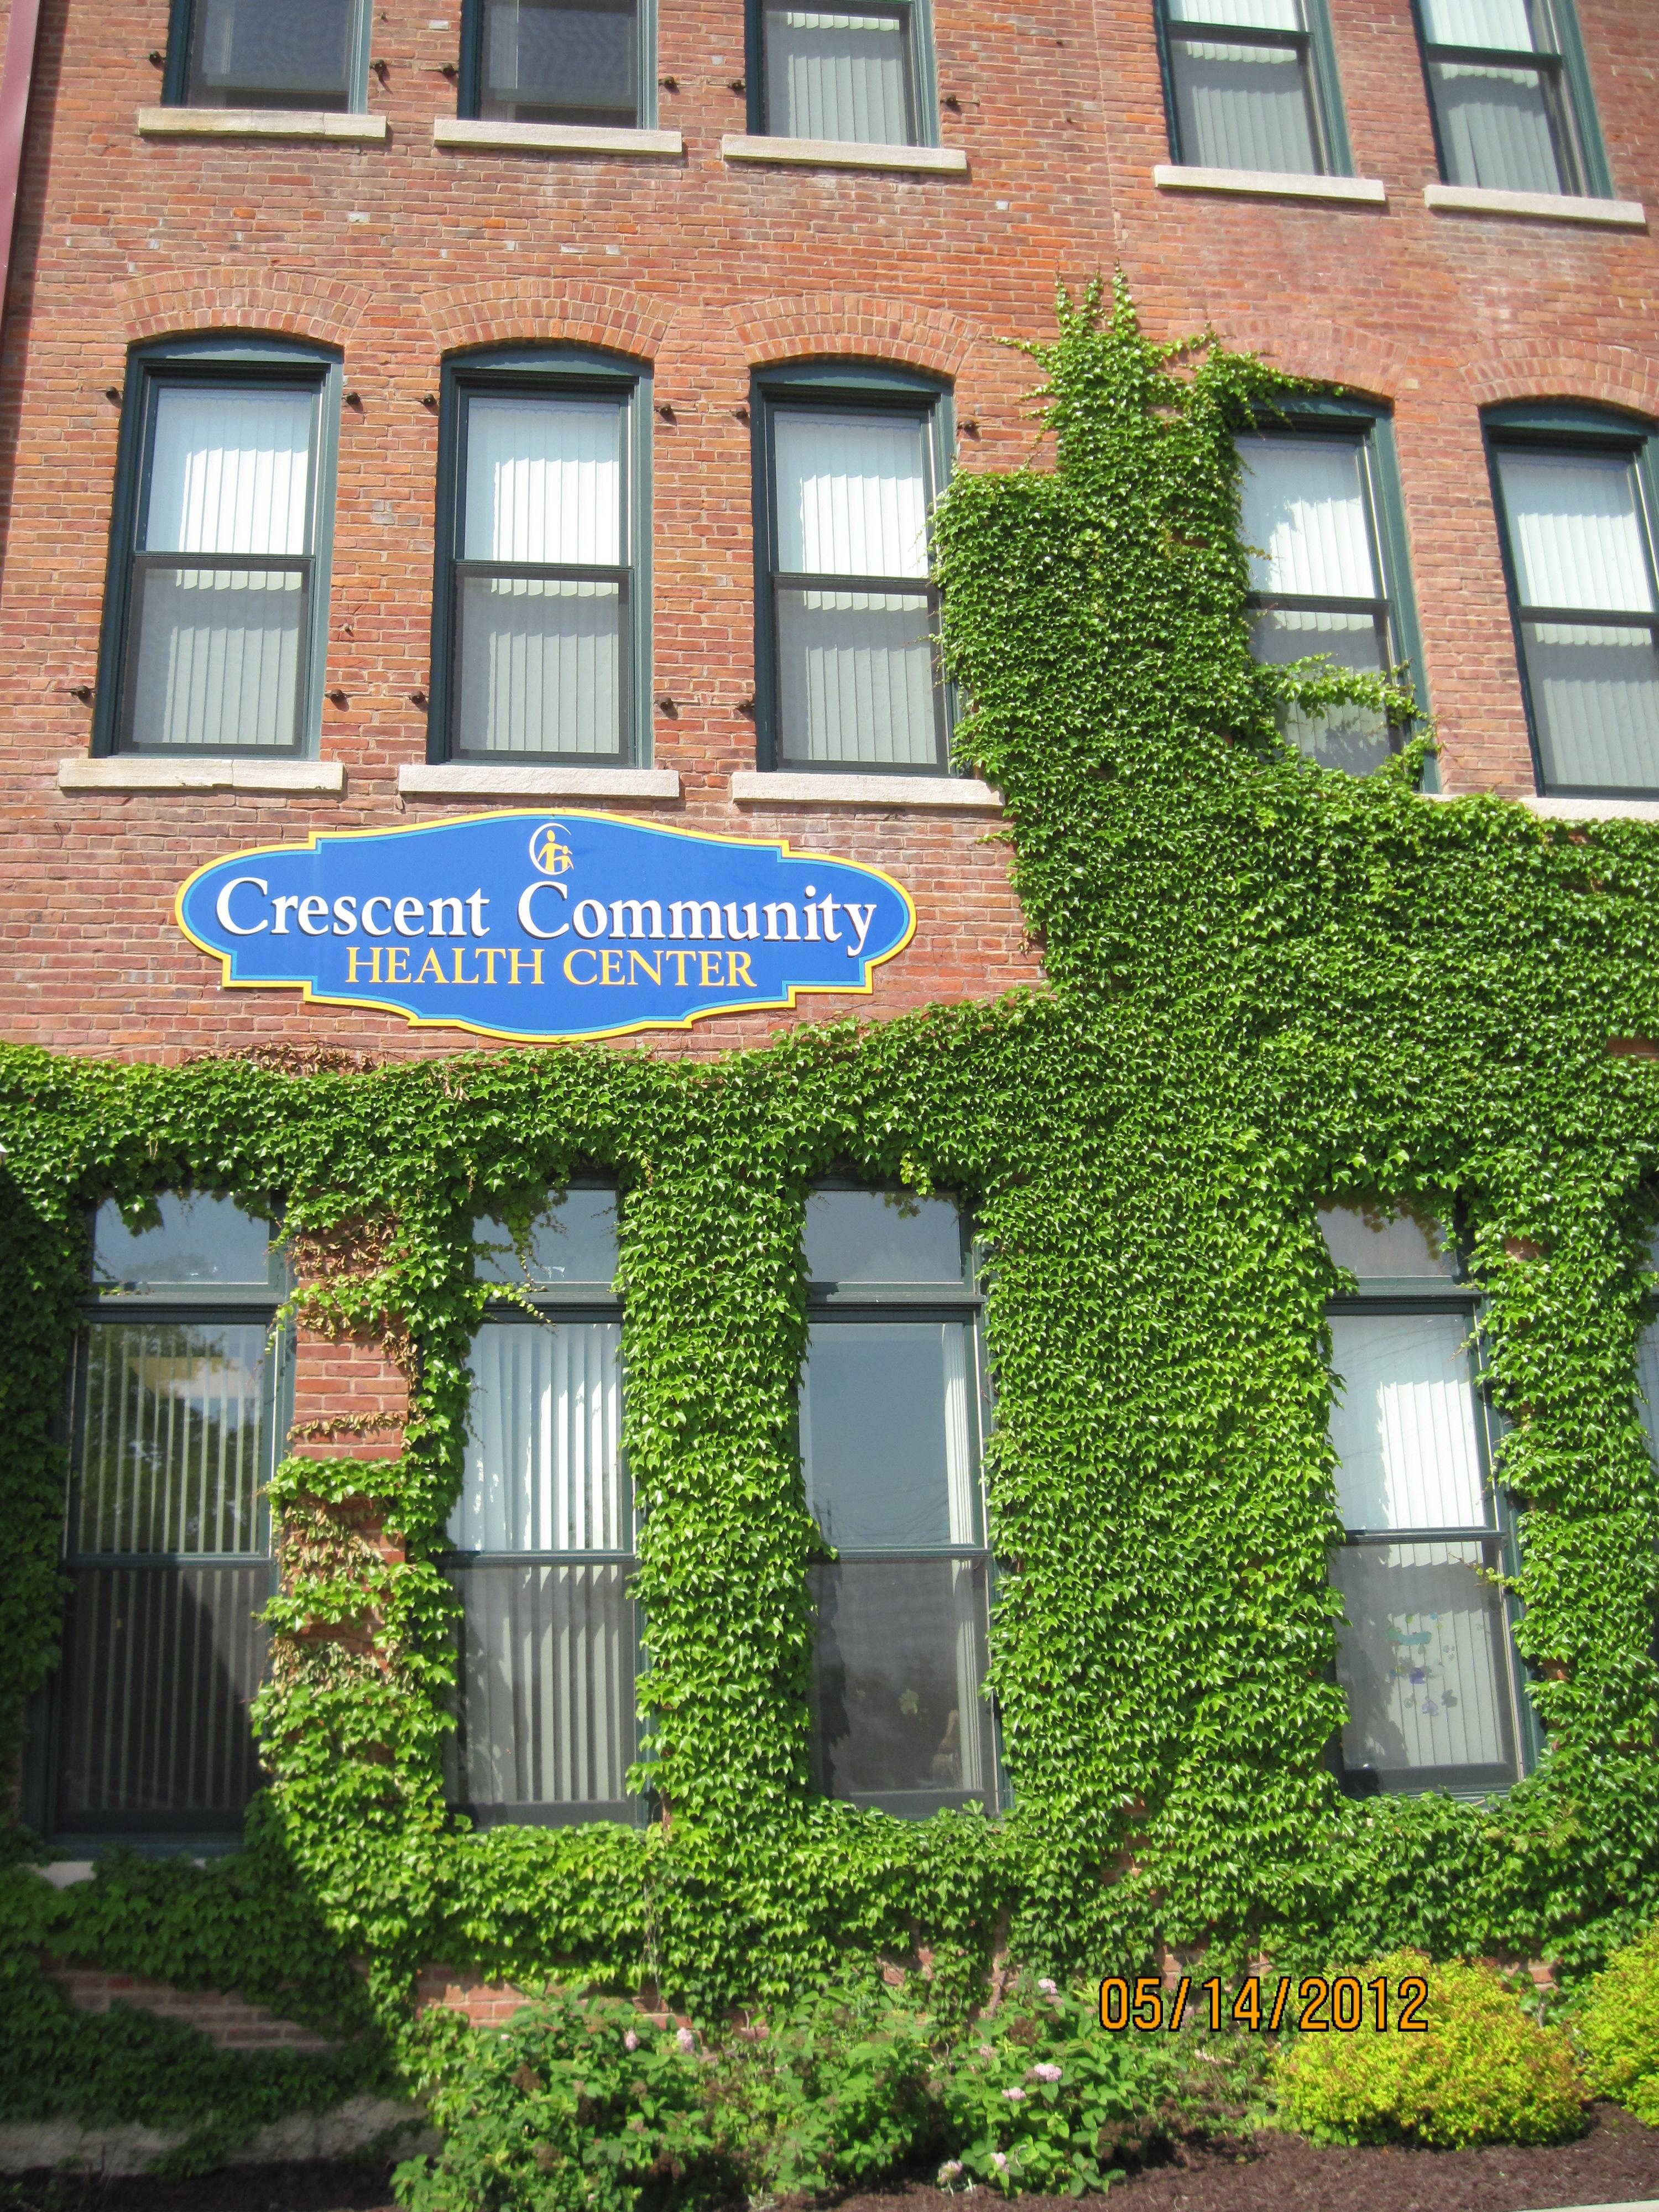 Crescent Community Health Center Image